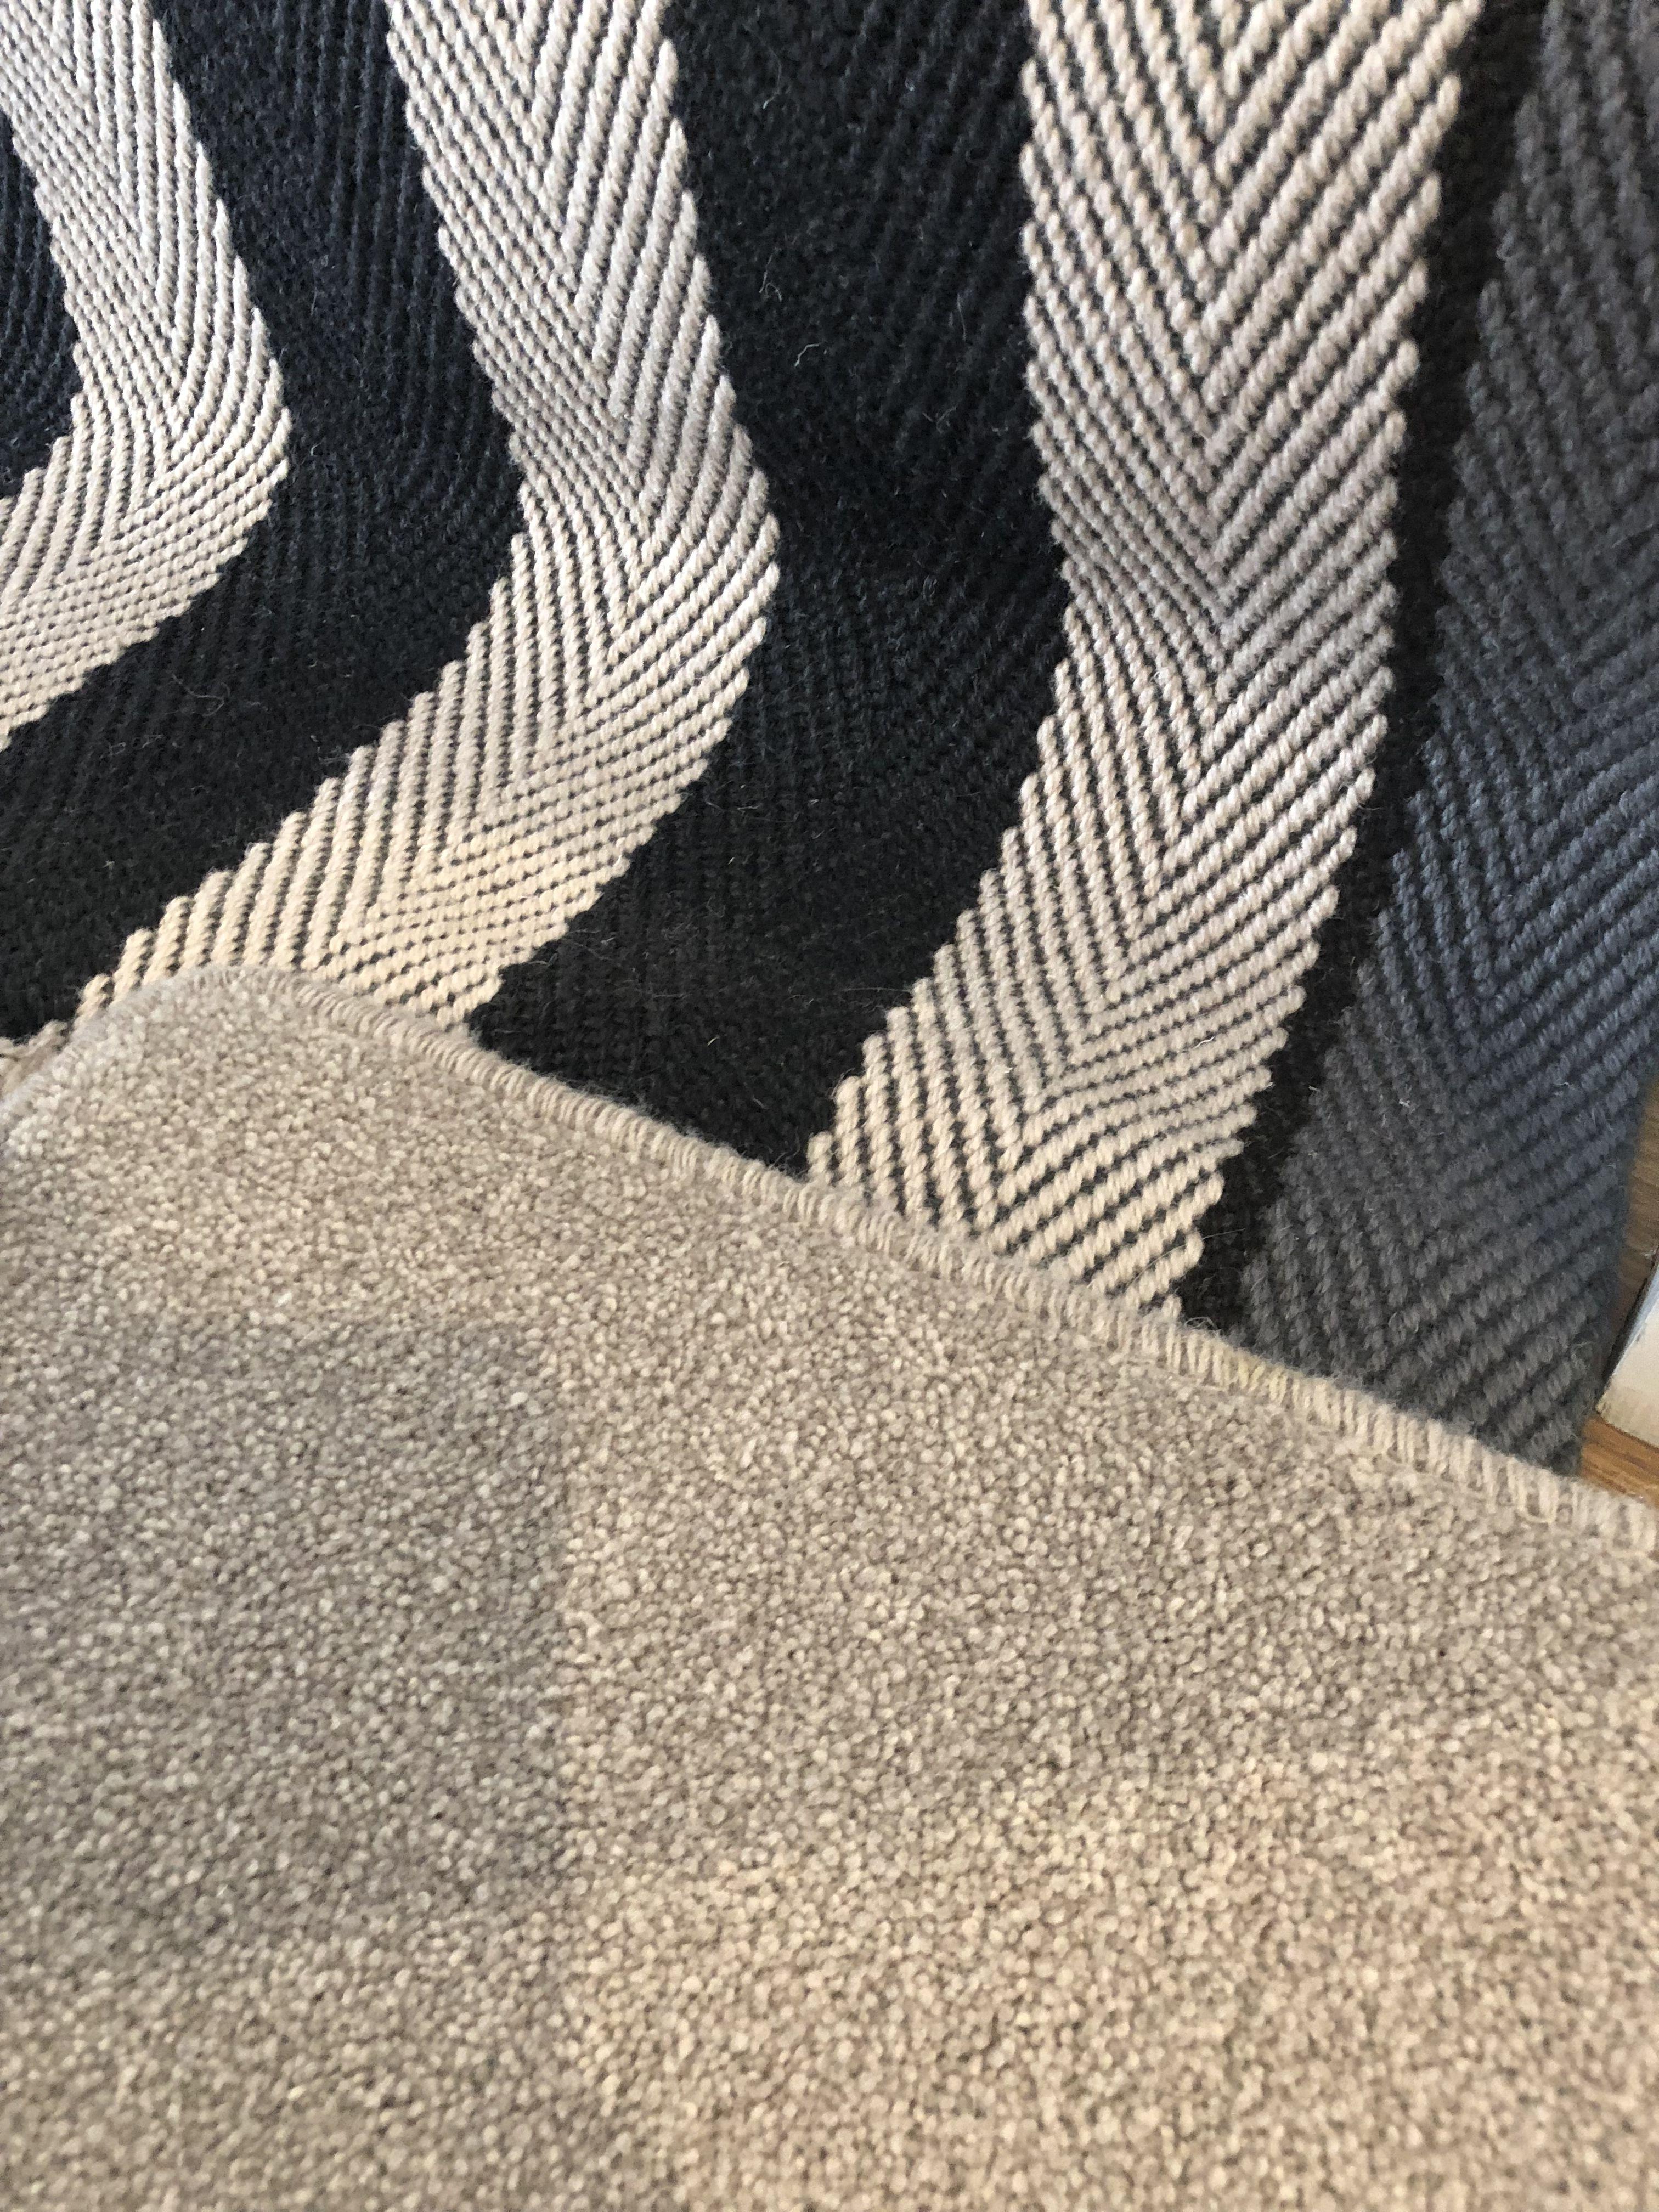 Best Pin By Jo Saunders On Hall Rugs Carpet Flip Flops 400 x 300